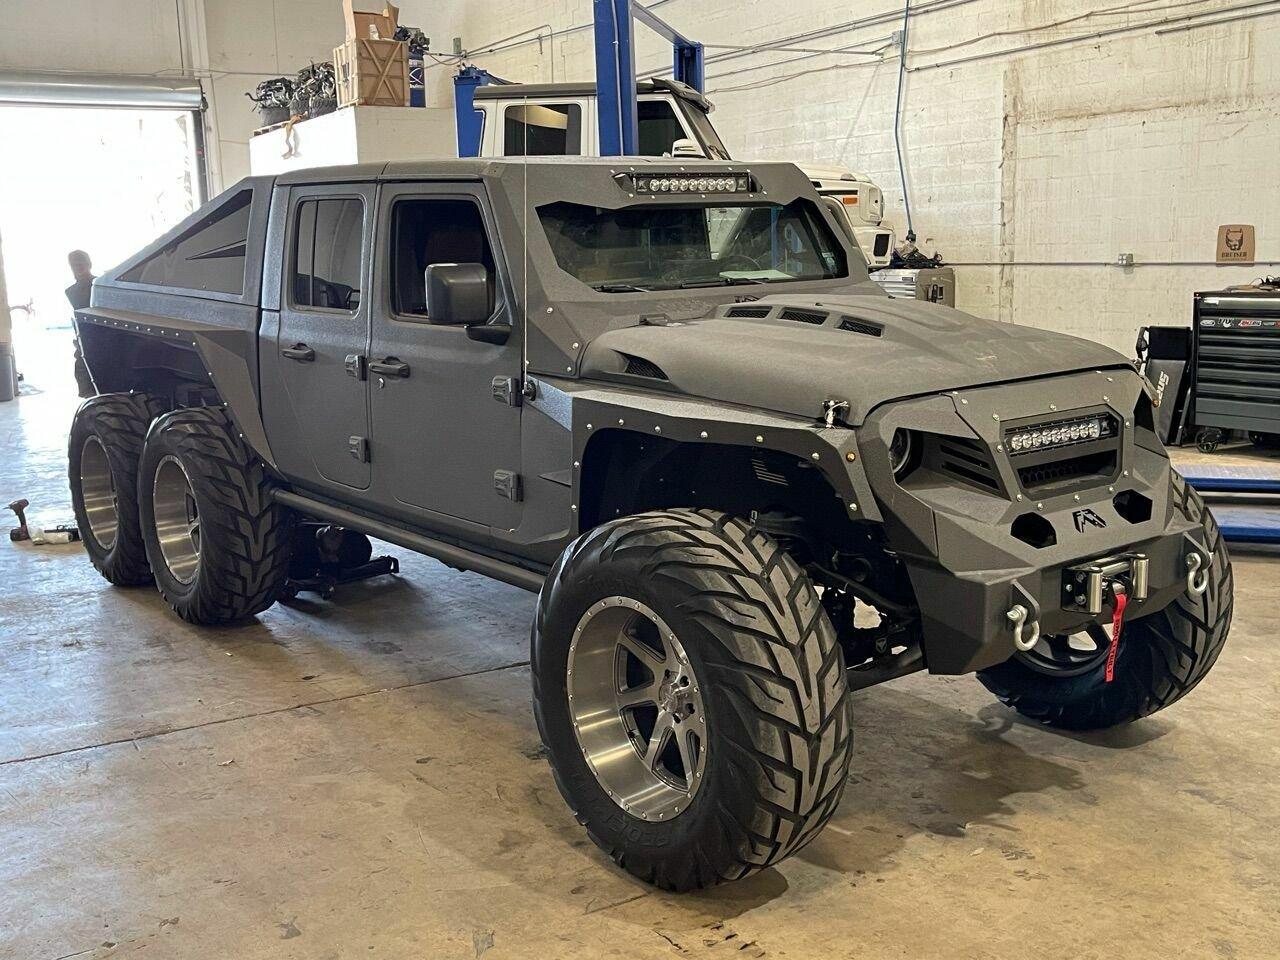 Jeep-Apocalypse-Hellfire-6x6-3